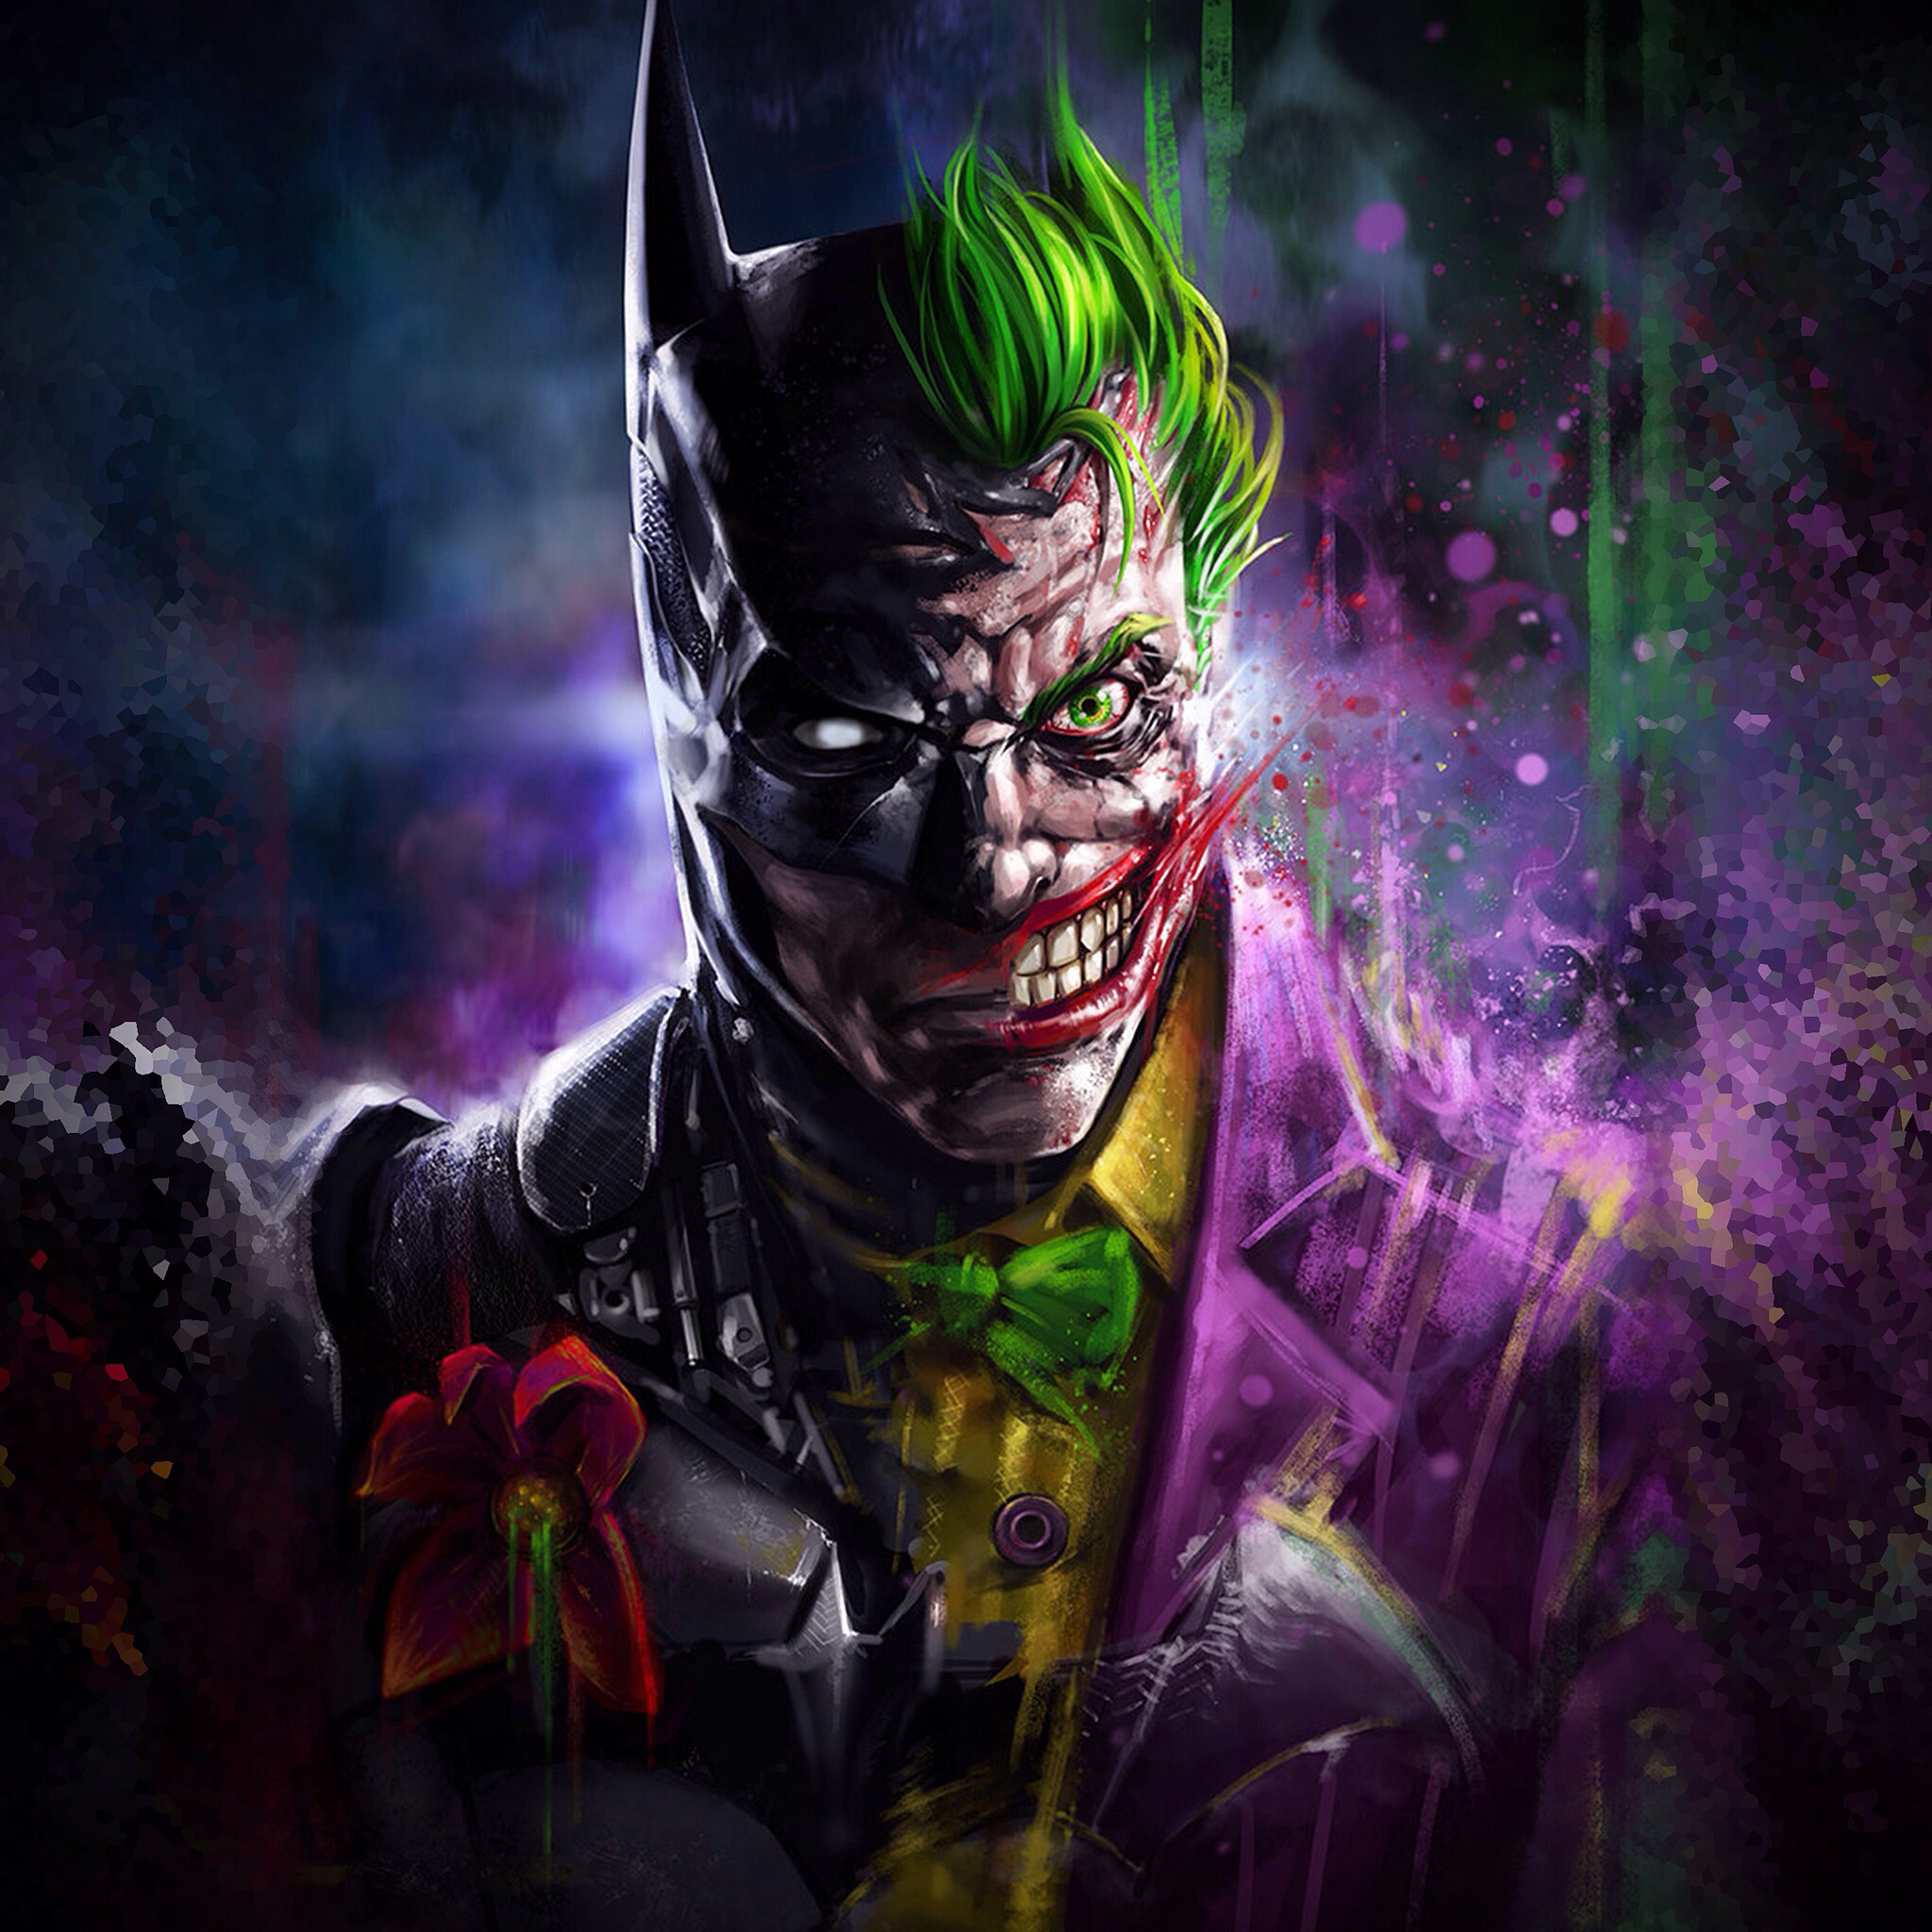 Batman Joker Art, HD Superheroes, 4k Wallpapers, Images ...